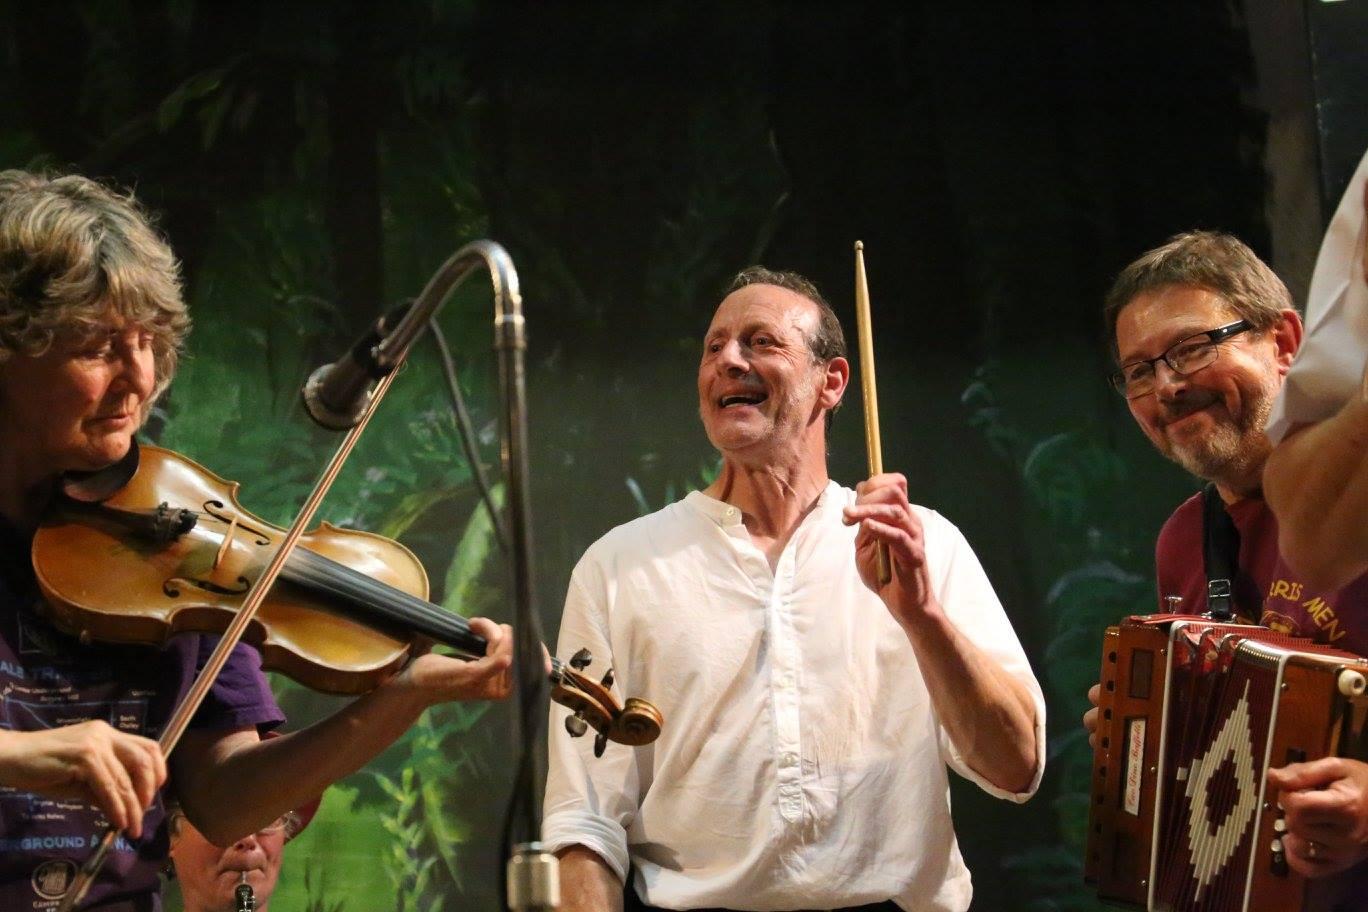 Three musicians on stage